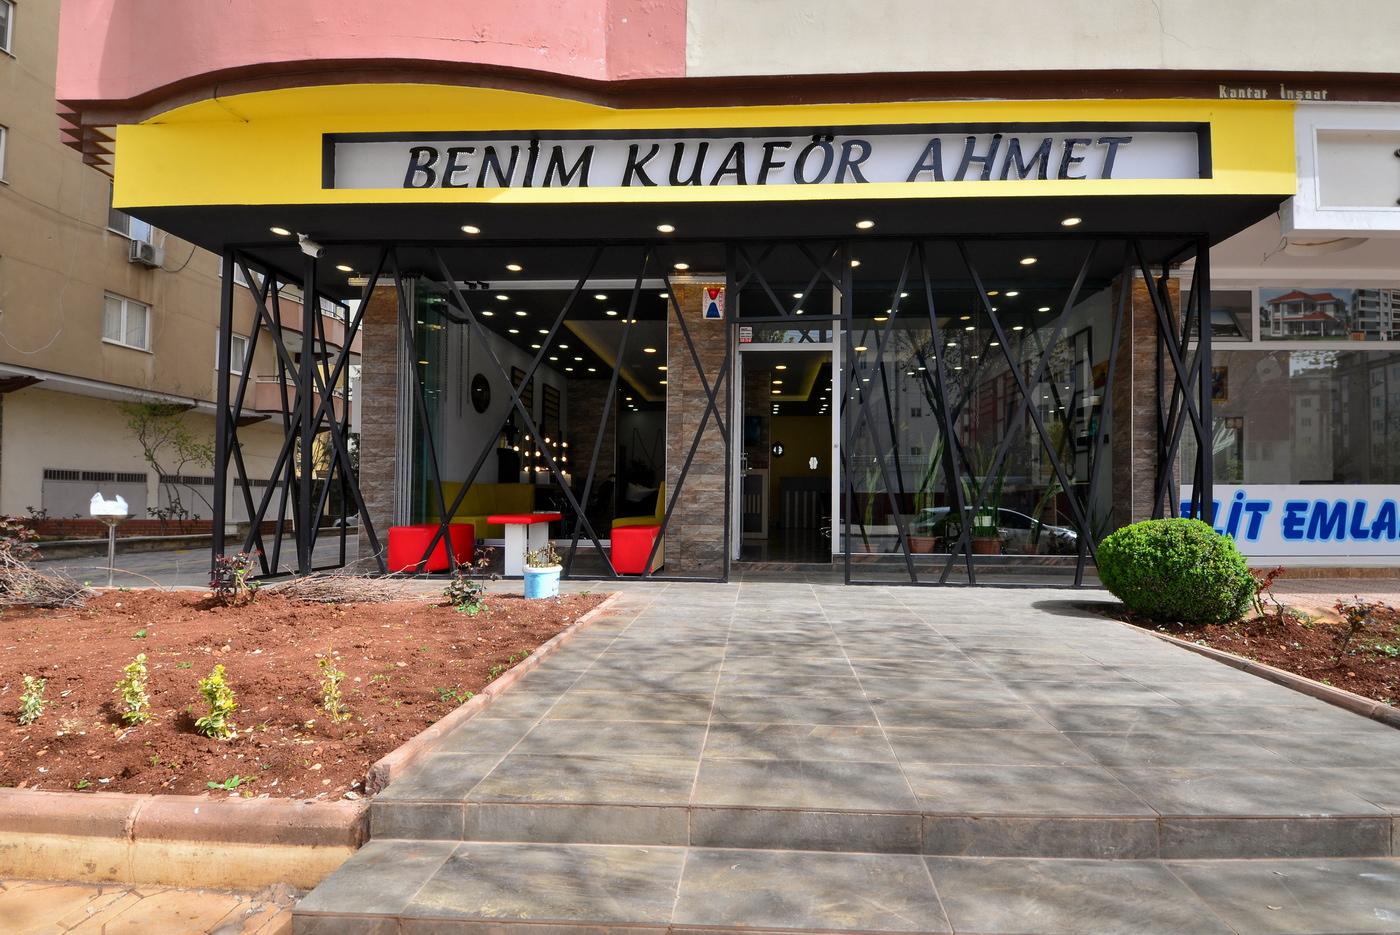 Gaziantep - Benim Kuaför Ahmet